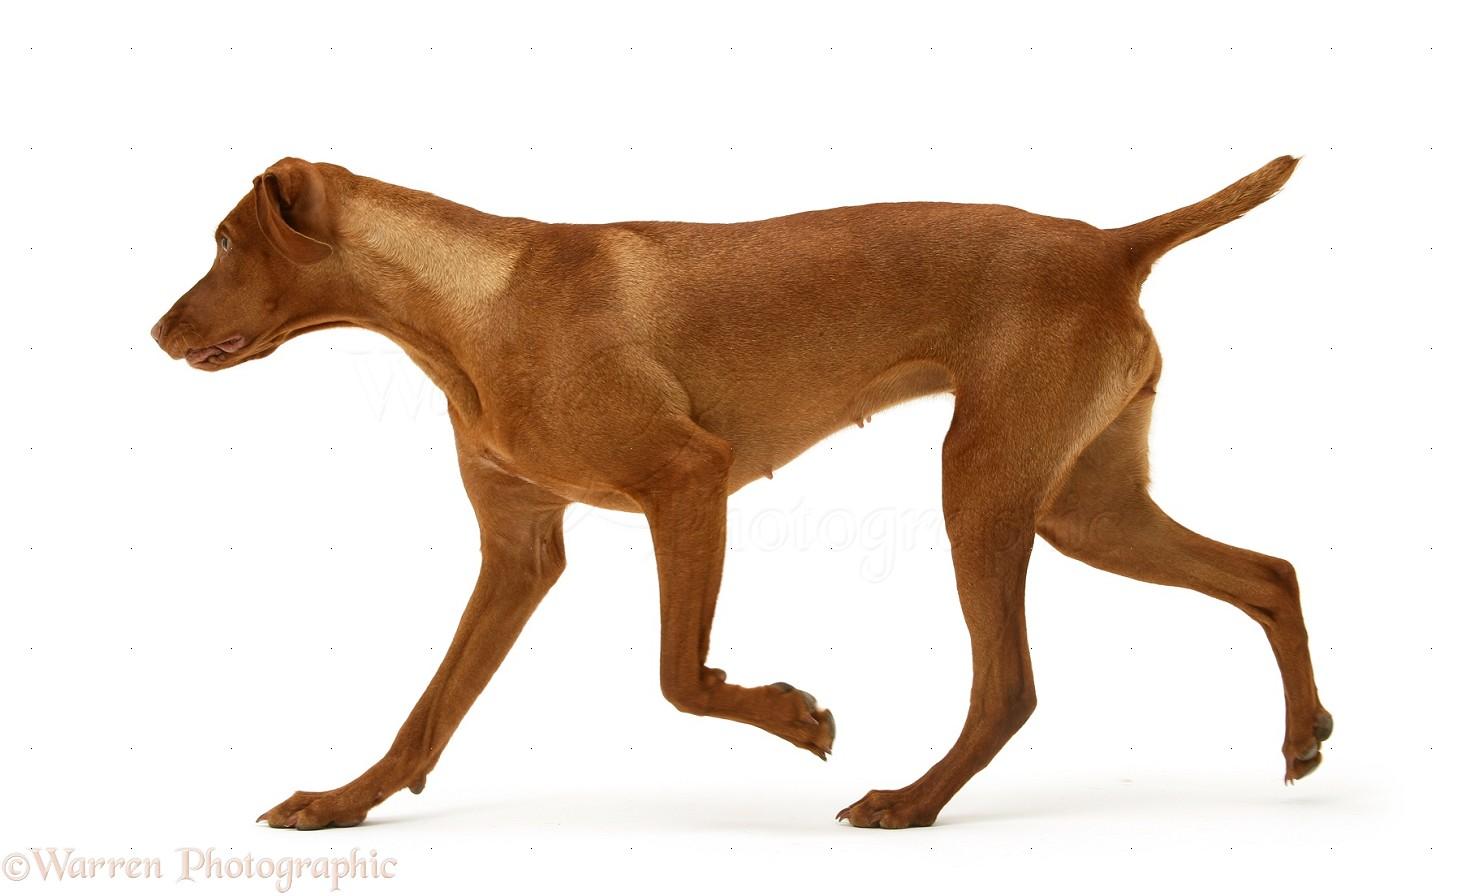 Dog Hungarian Vizsla Bitch Trotting Across Photo Wp13954